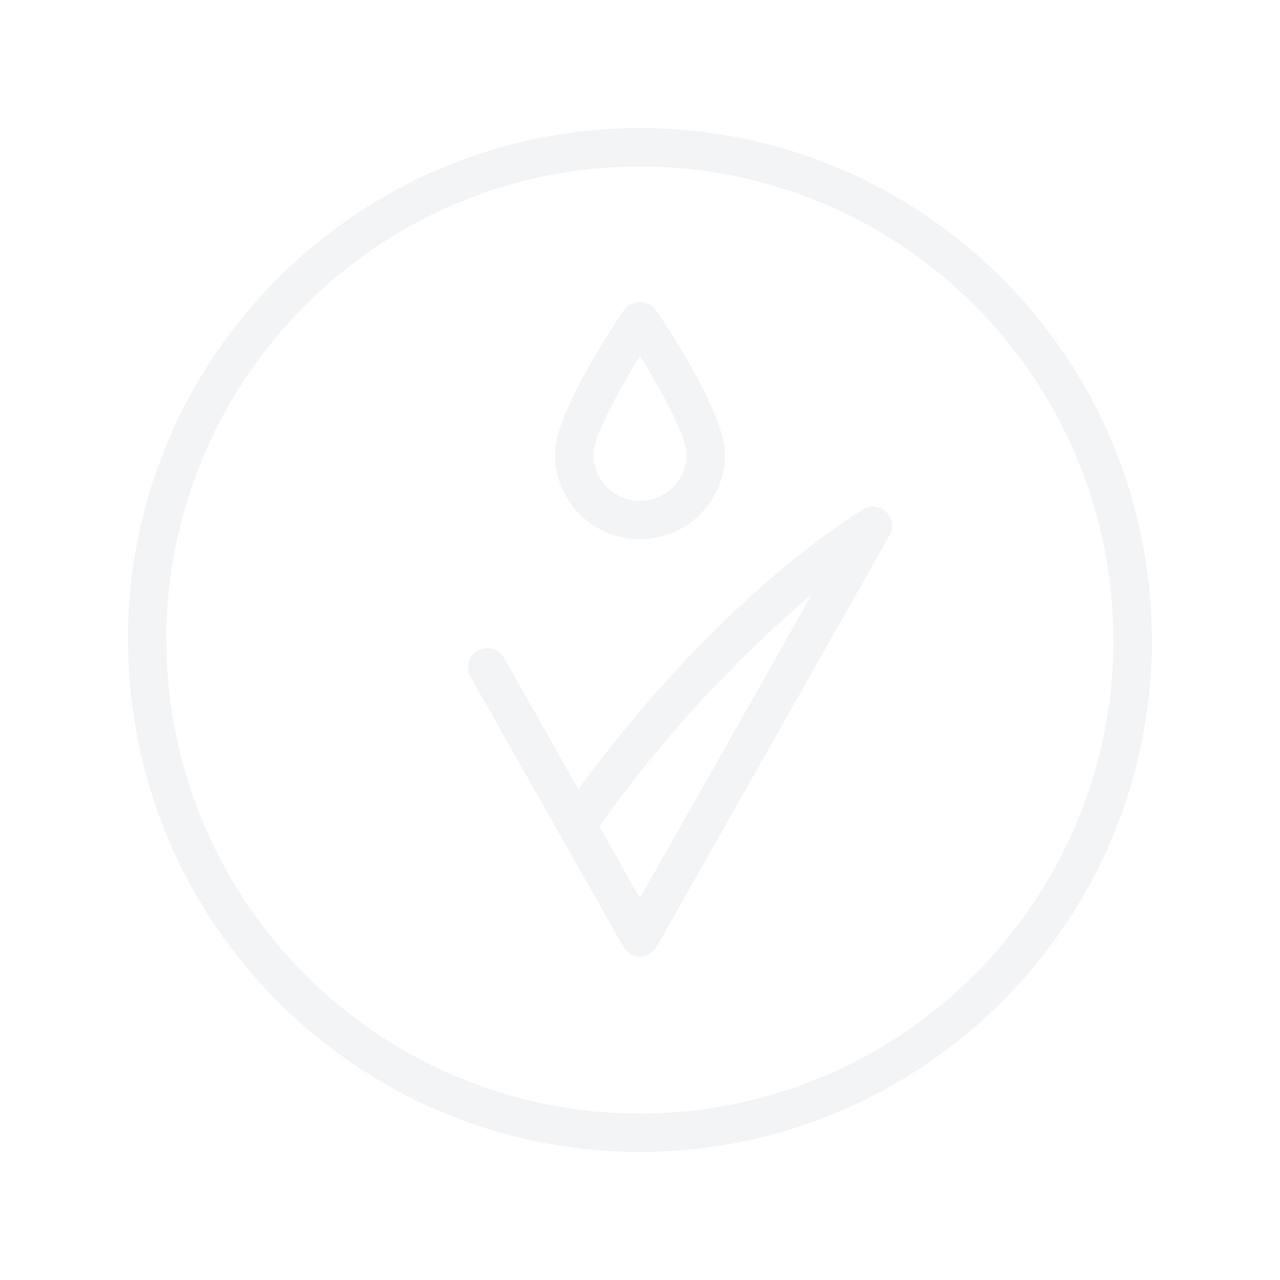 HOLIKA HOLIKA One Solution Anti-Wrinkle Ampoule противоморщинный серум 30ml